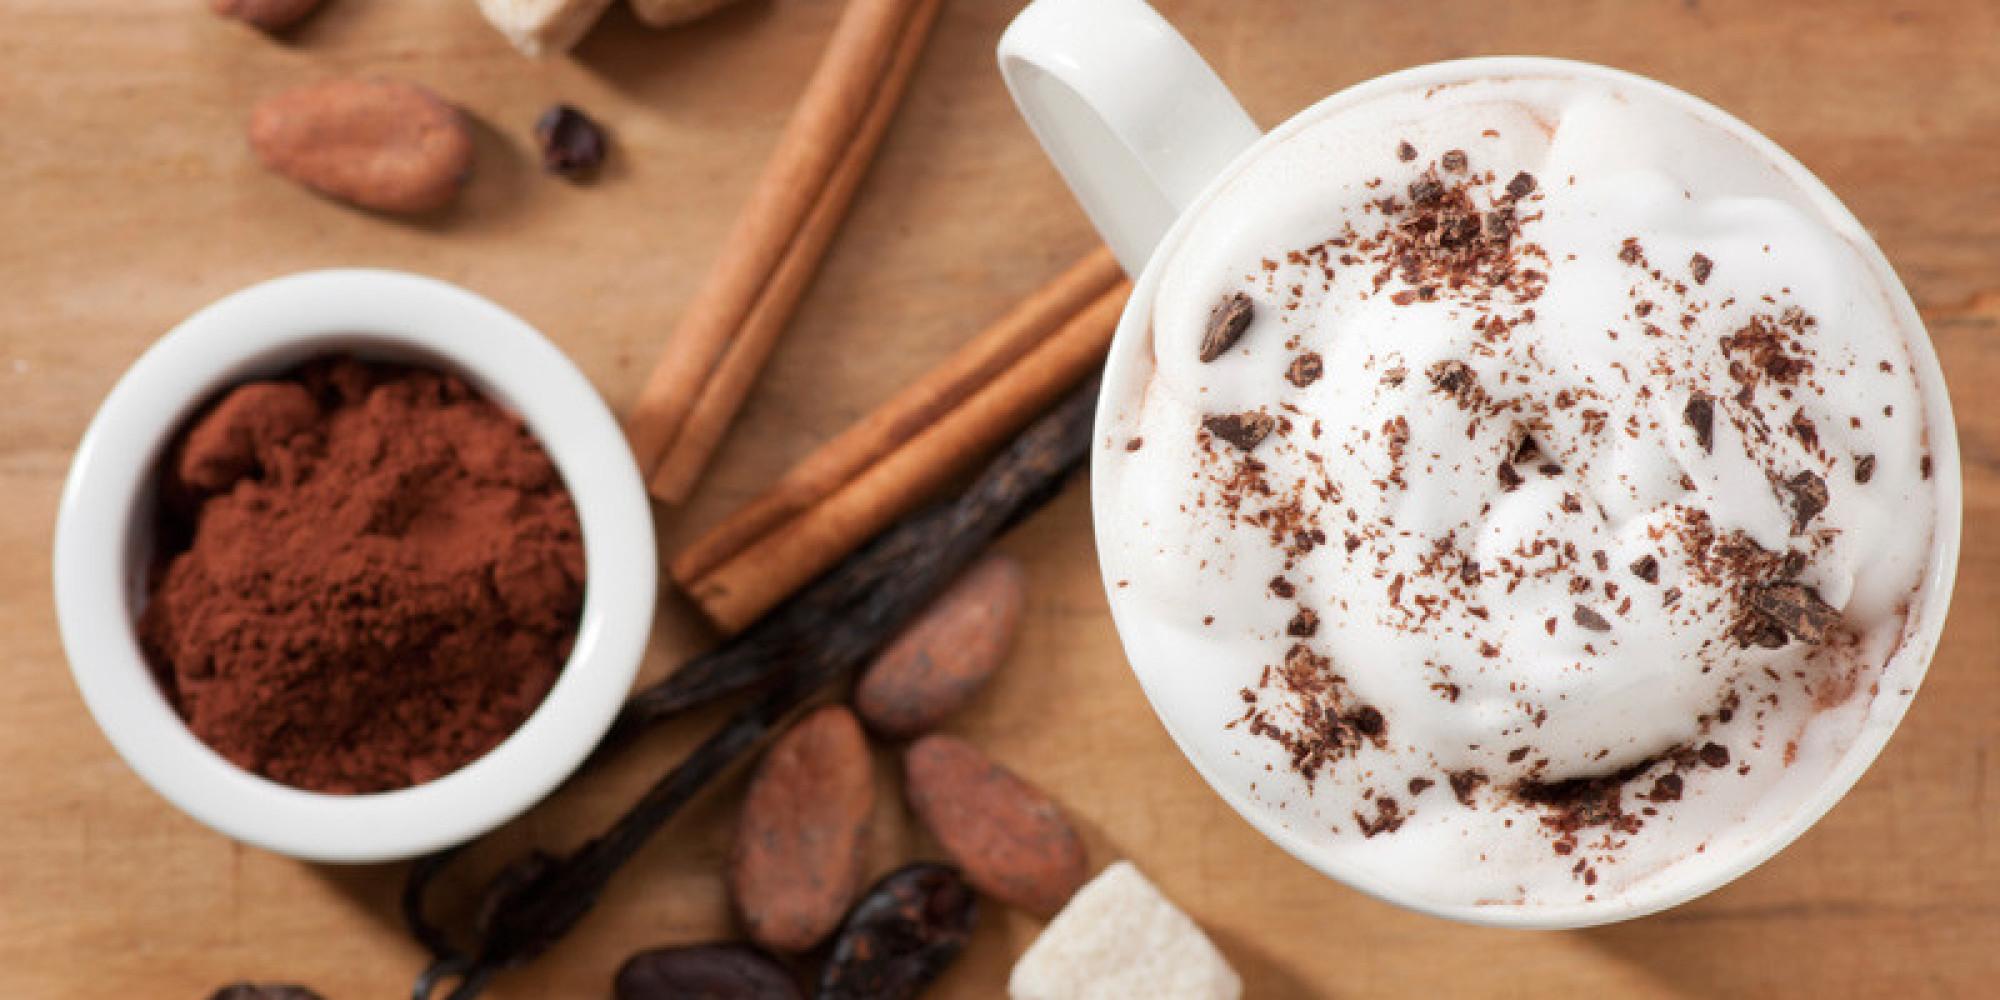 Hot Cocoa Helps Brain Function in Elderly